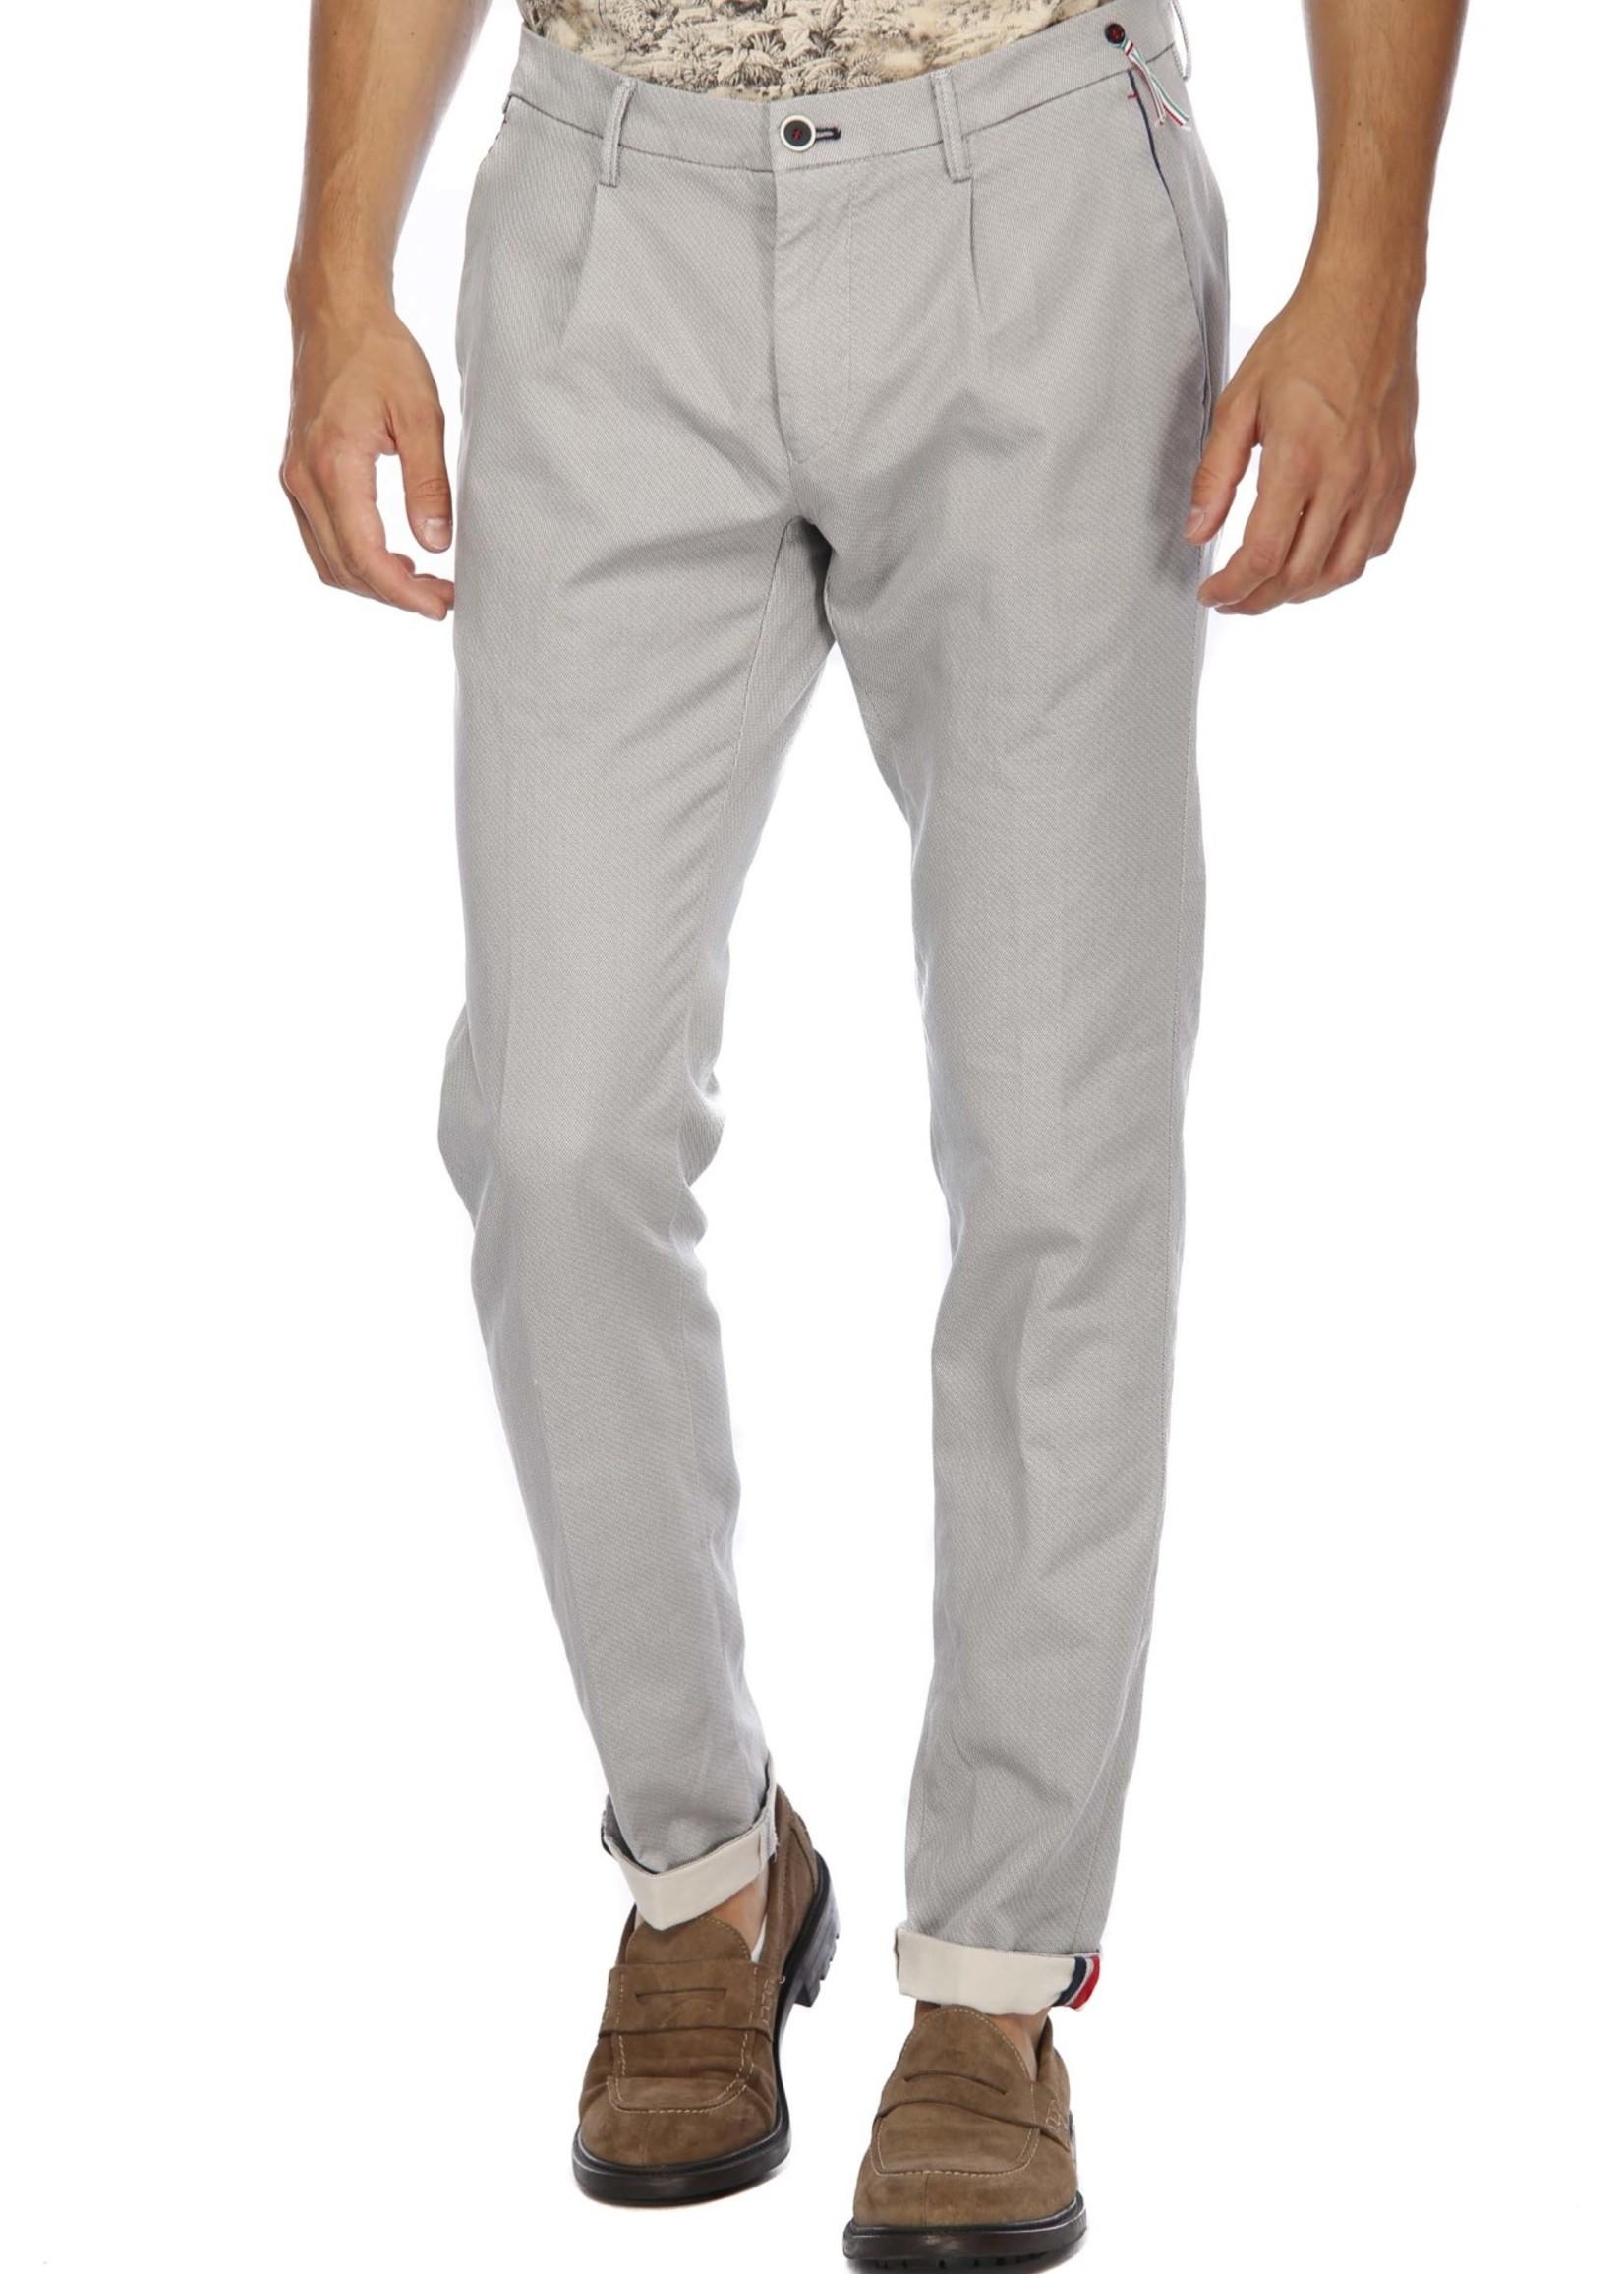 Mason's Pantalon chino à un pli Toscana Golf avec jersey imprimé | Gris | Mason's